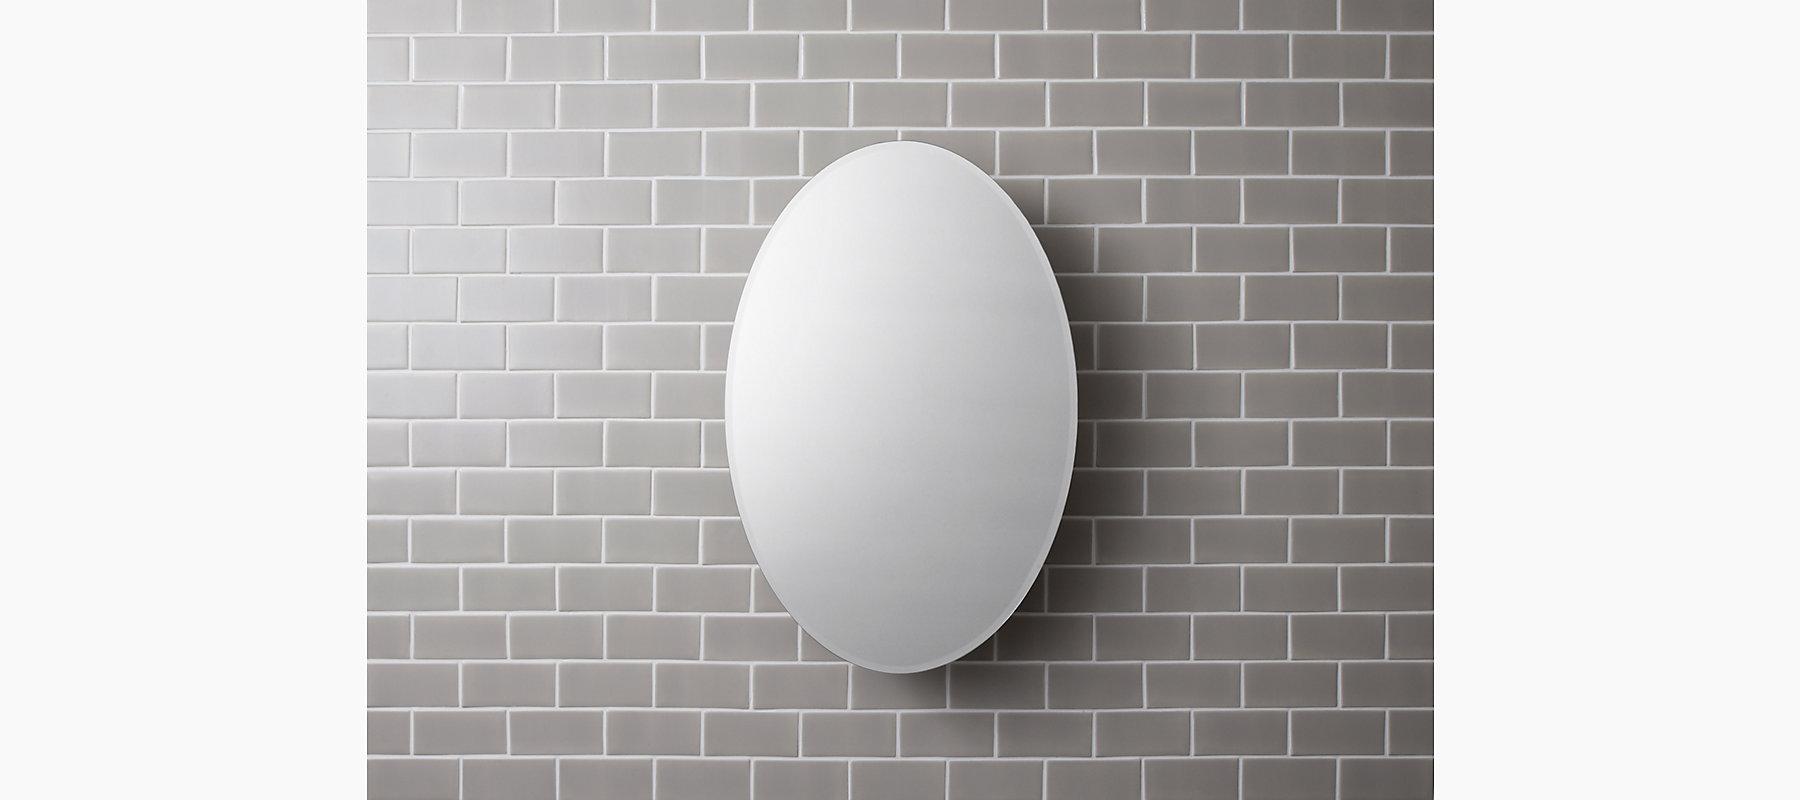 demandit mirror pegasus org with recessed small oval lights door medicine cabinet white canada